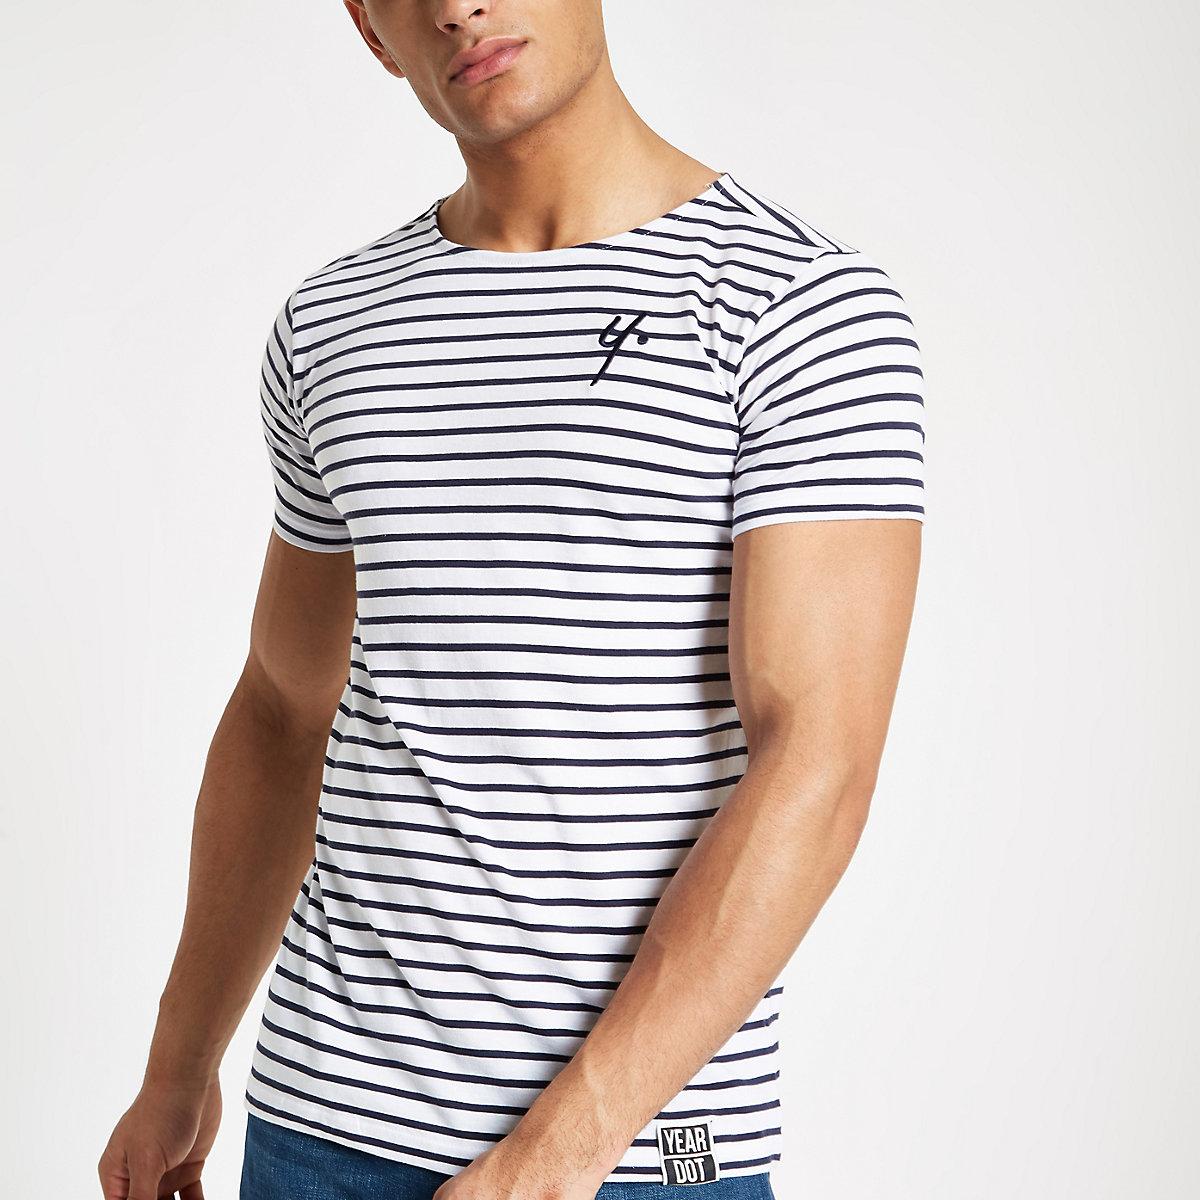 Year Dot white stripe T-shirt